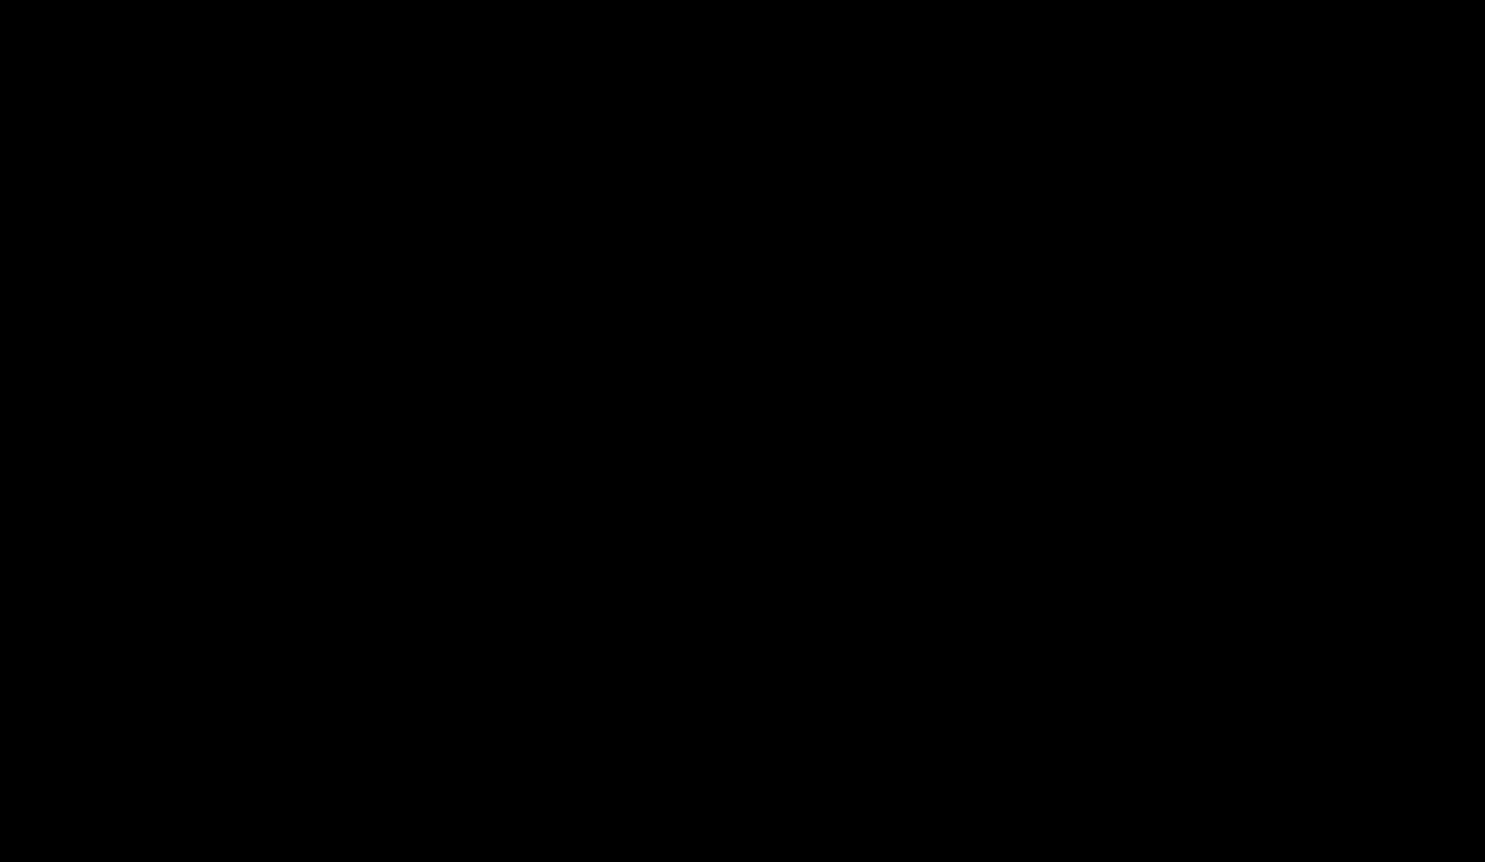 DBCO-dPEG®₁₂-TFP ester